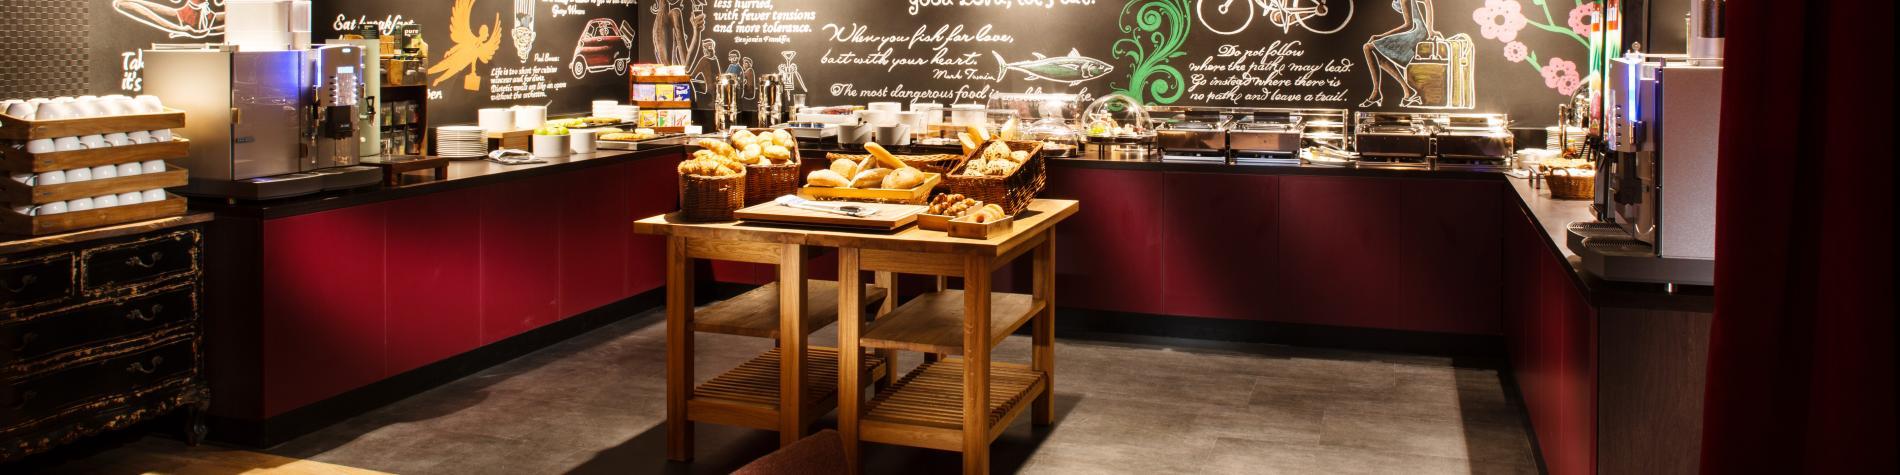 Salle du petit-déjeuner pentahotel Liège